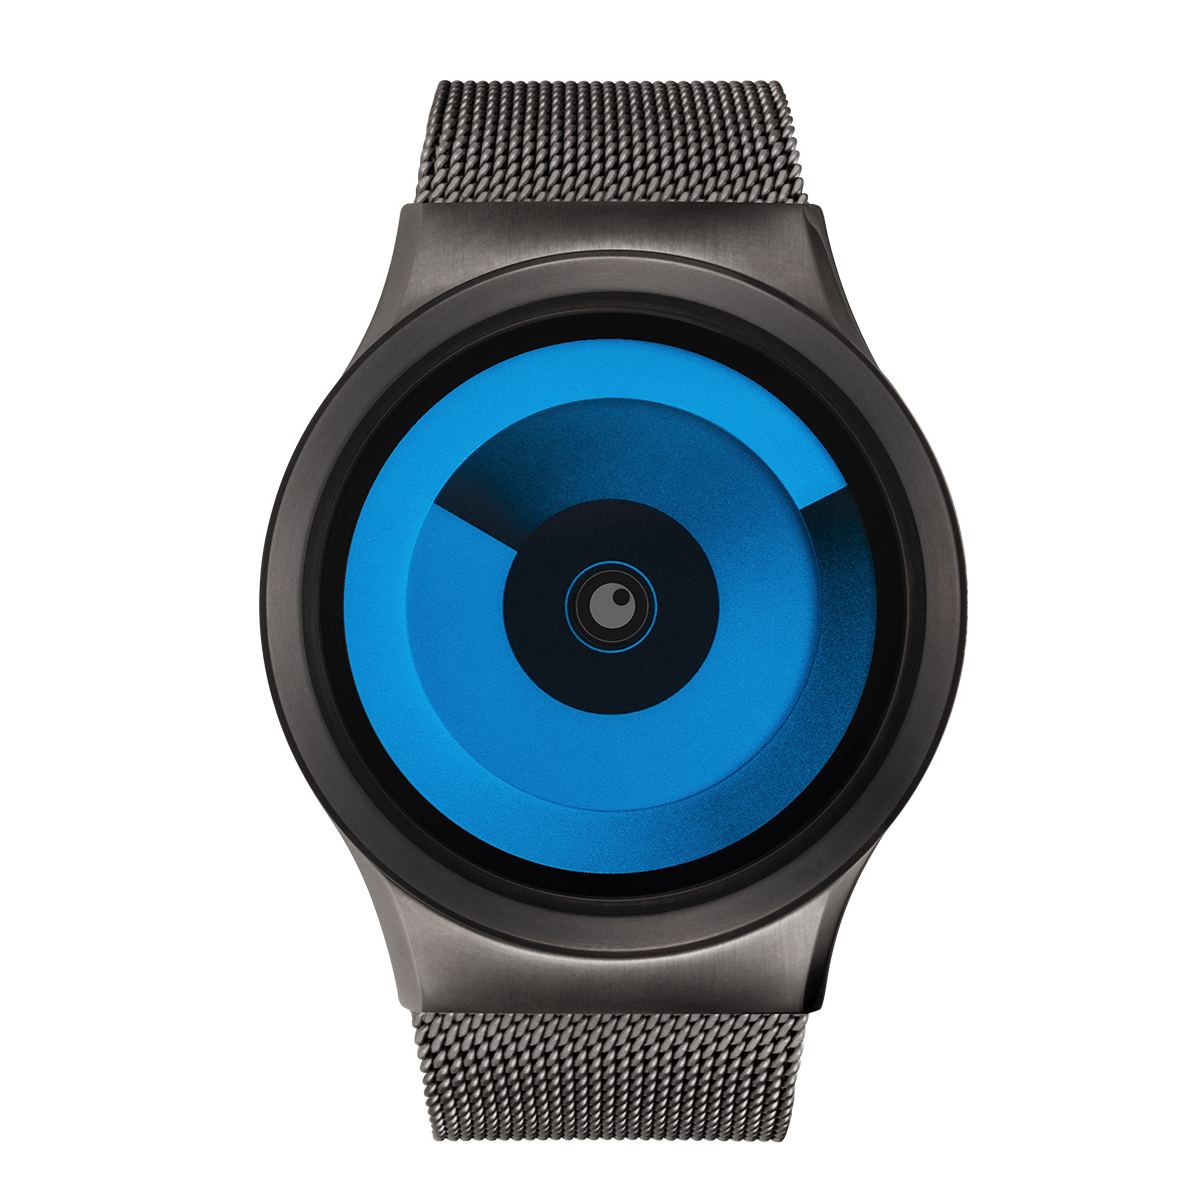 88e7be8b32 ZEROO SPIRAL GALAXY ゼロ 電池式クォーツ 腕時計 [W06015B02SM02] ブルー デザインウォッチ ペア用 メンズ  レディース ユニセックス おしゃれ時計 デザイナーズ ...